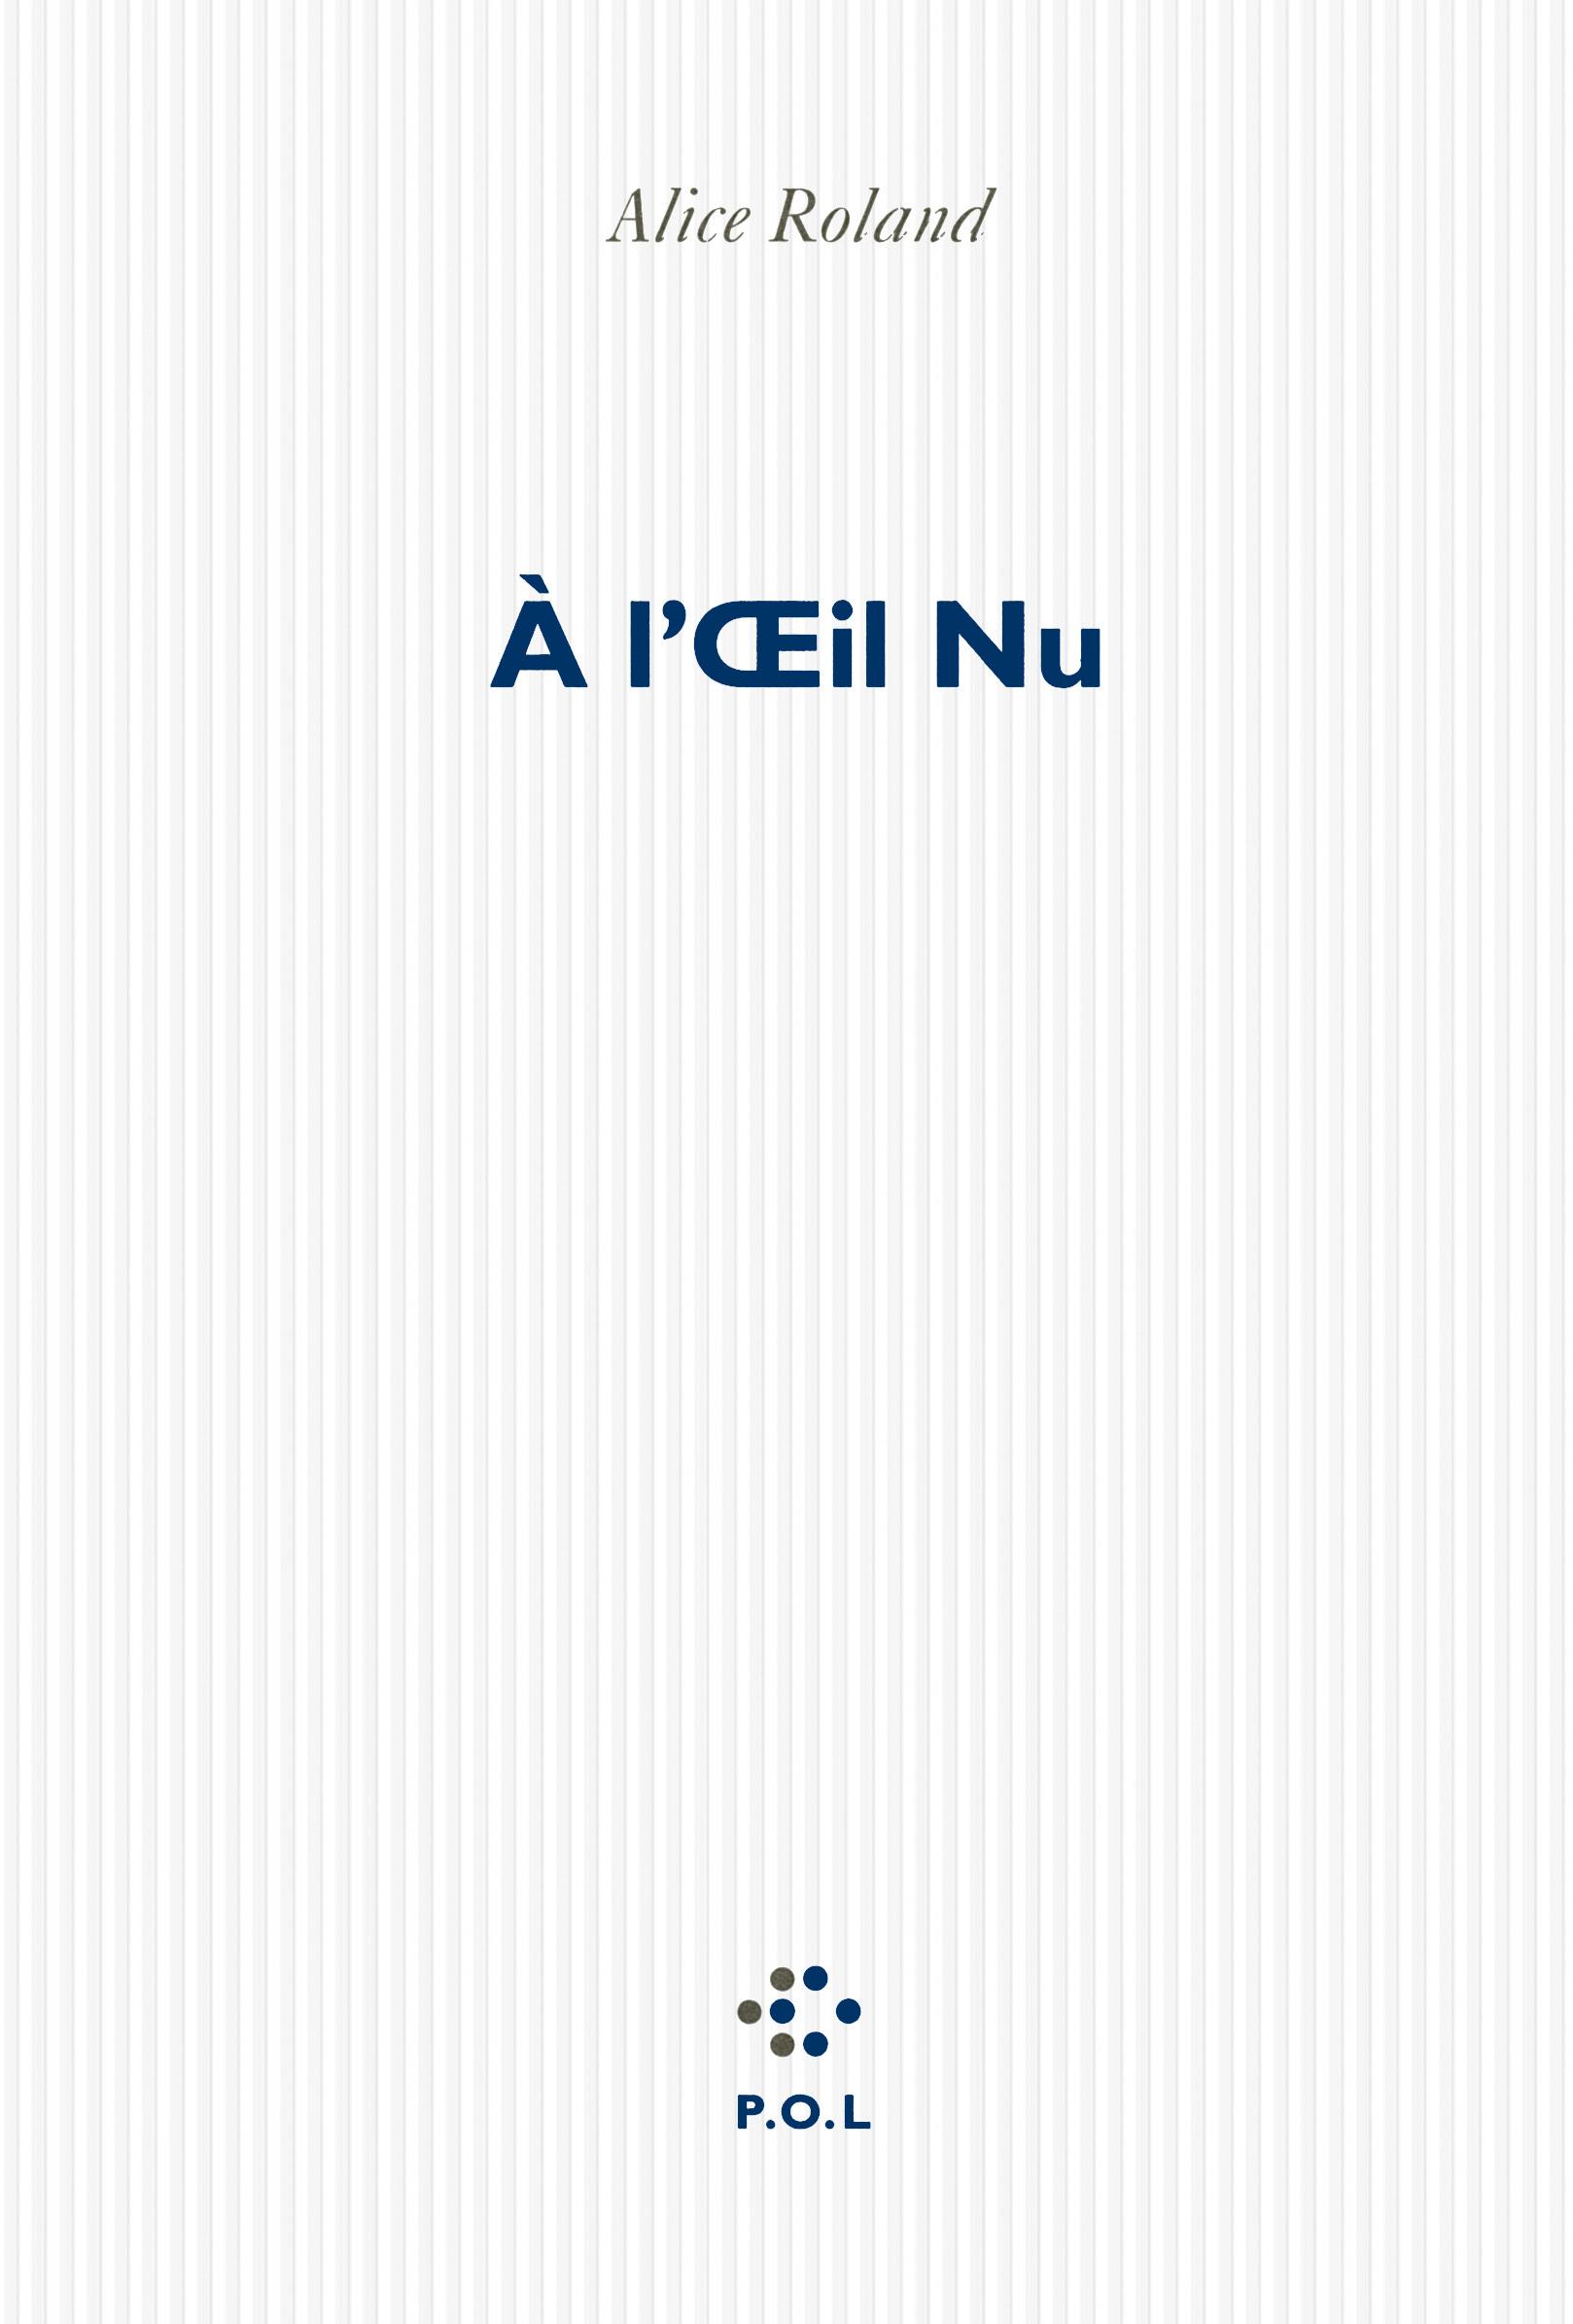 A L'OEIL NU